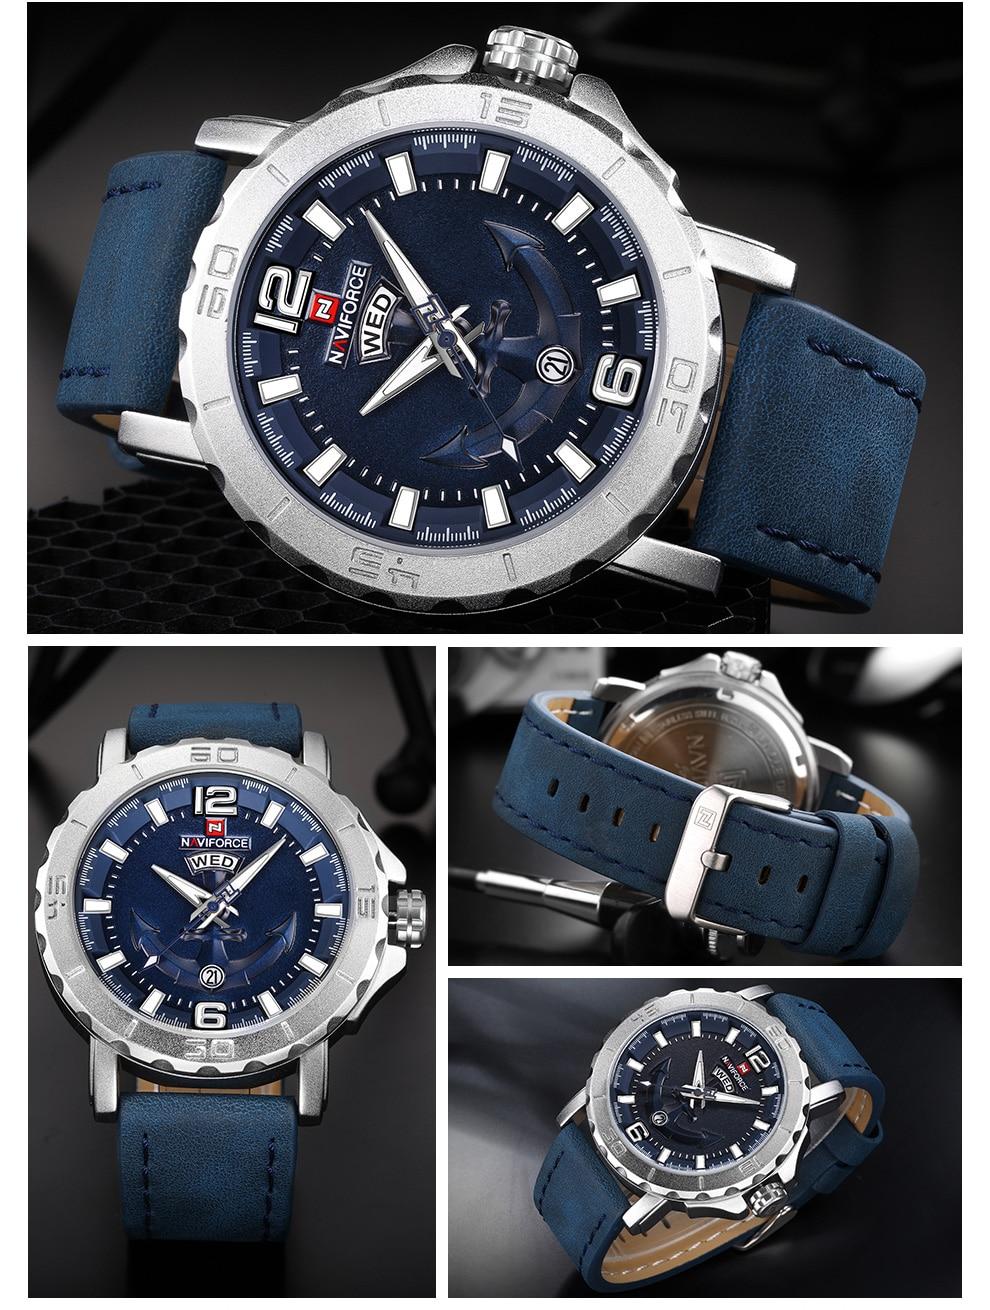 Hc7ed28e460824069bccca06eb51f5f9aL Top Luxury Brand NAVIFORCE Mens Sport Watches Casual Leather Strap Waterproof Military Quartz WristWatch Clock Male Reloj Hombre